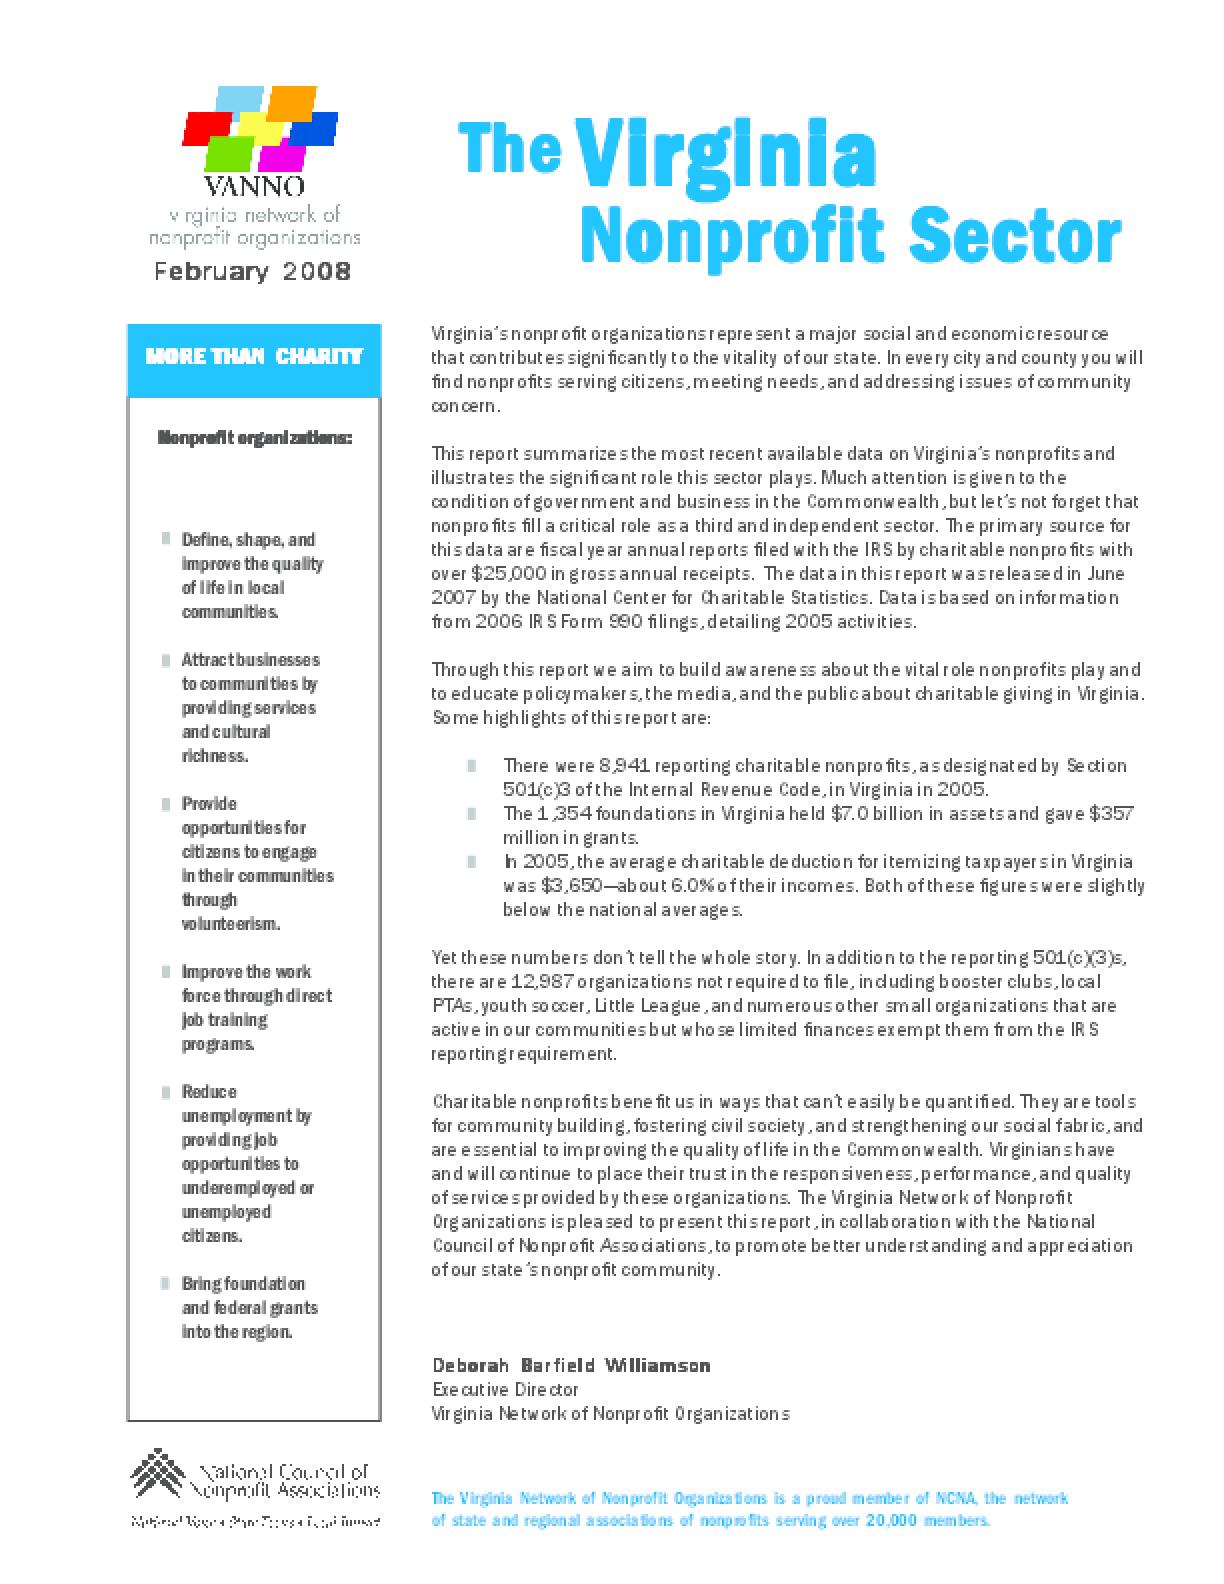 The Virginia Nonprofit Sector